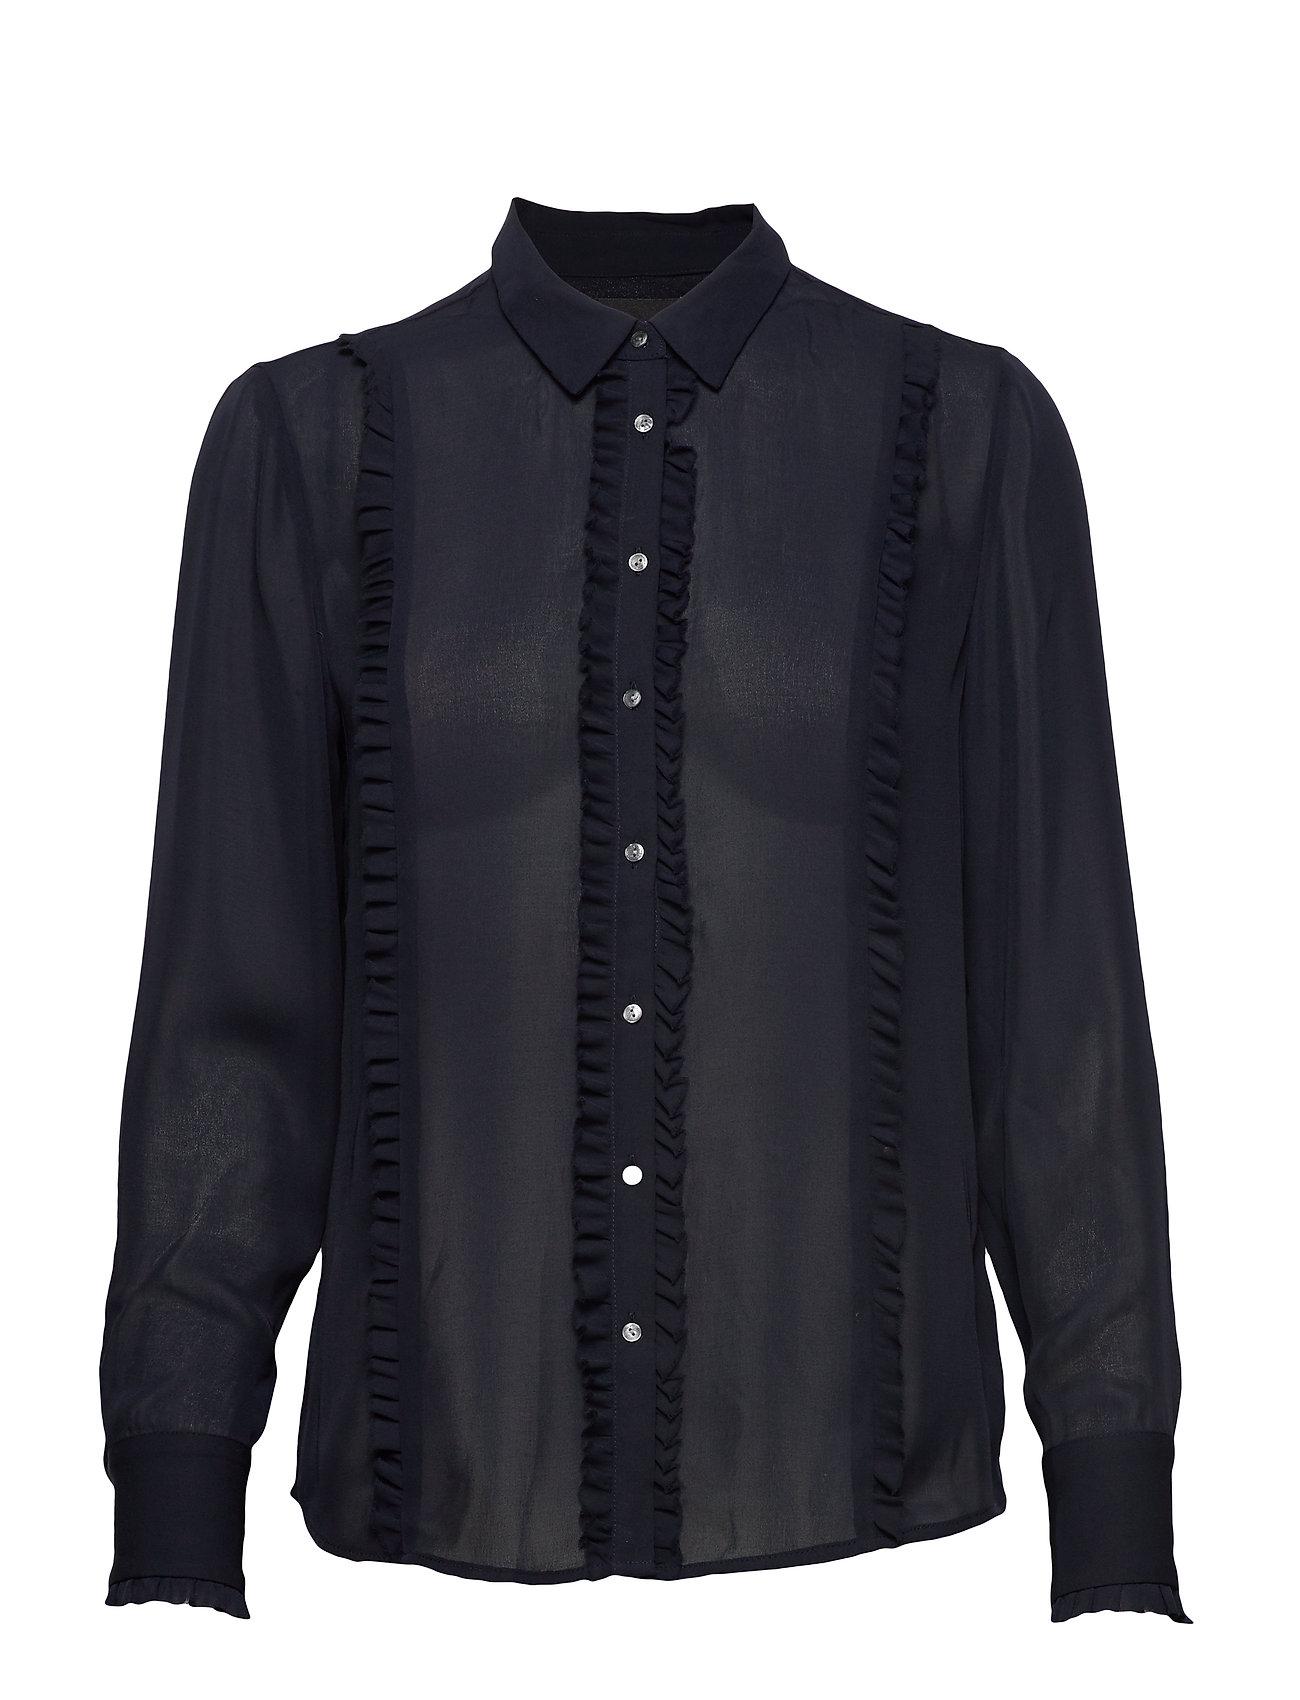 Scotch & Soda Regular fit shirt with ruffles - NIGHT